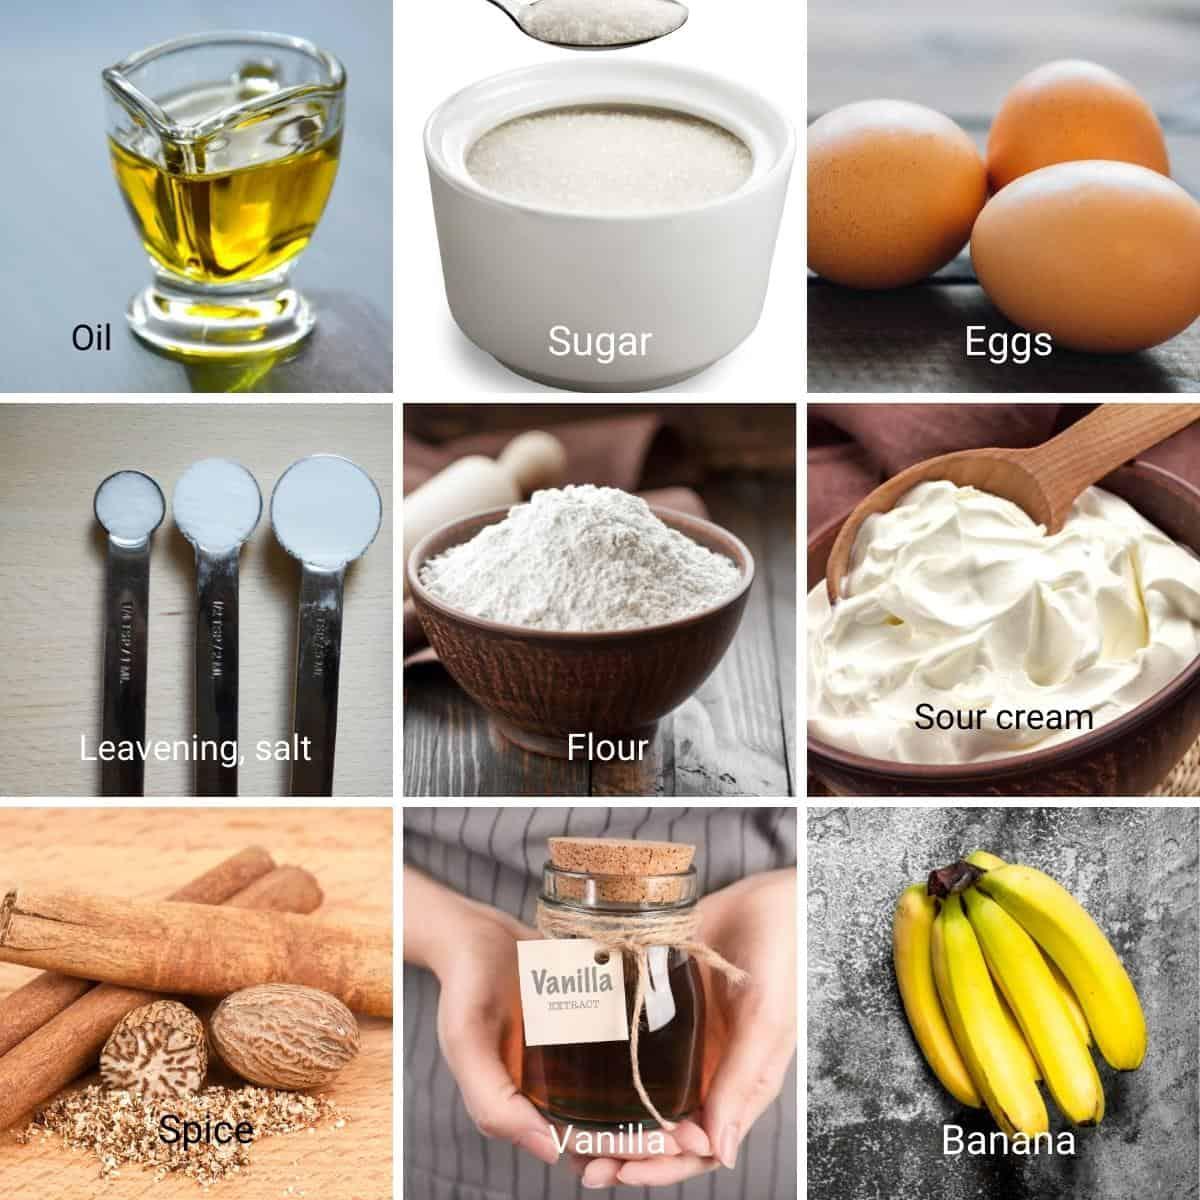 Ingredients for making a banana cake.